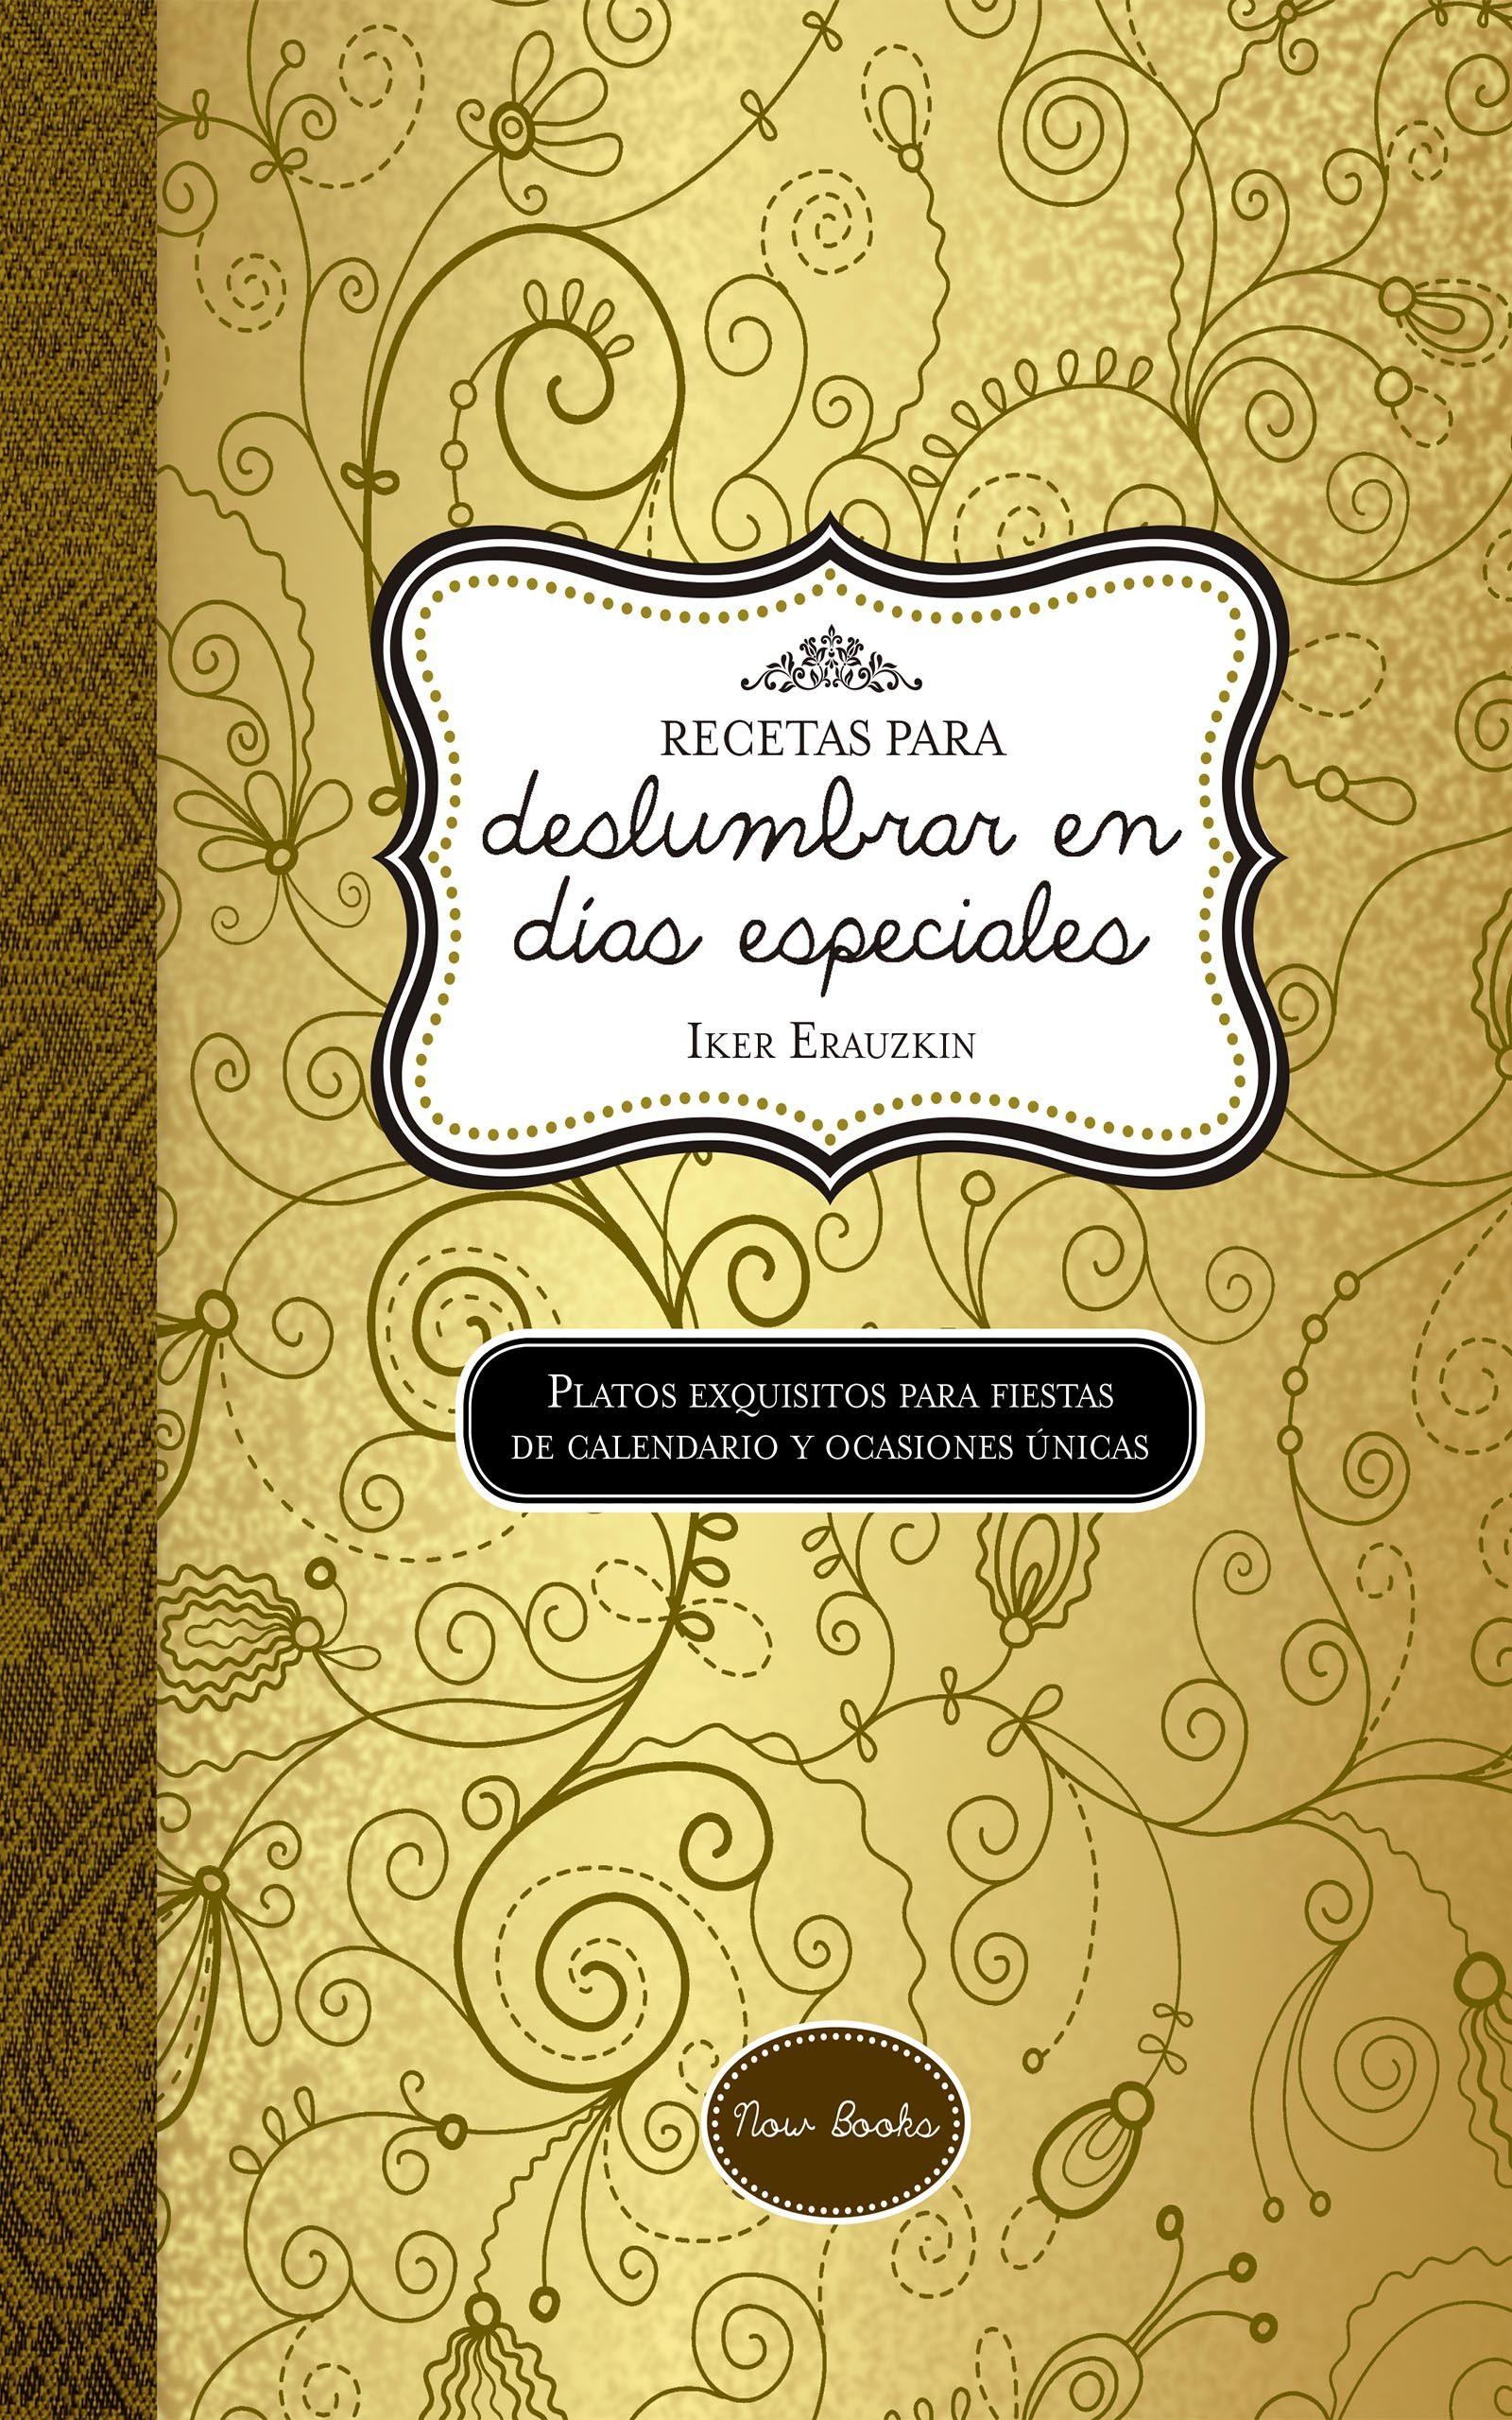 Recetas Para Deslumbrar En Días Especiales por Iker Erauzkin